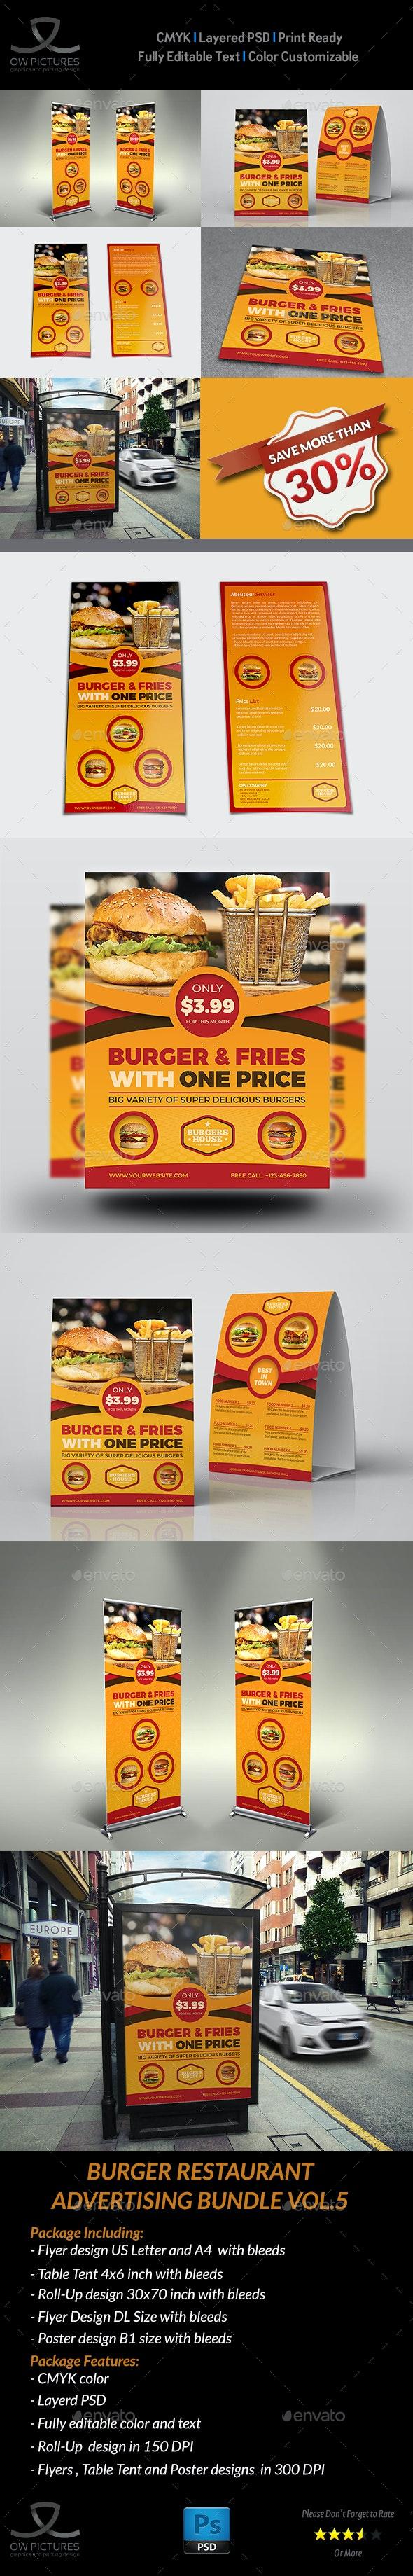 Burger Restaurant Advertising Bundle Vol.5 - Signage Print Templates